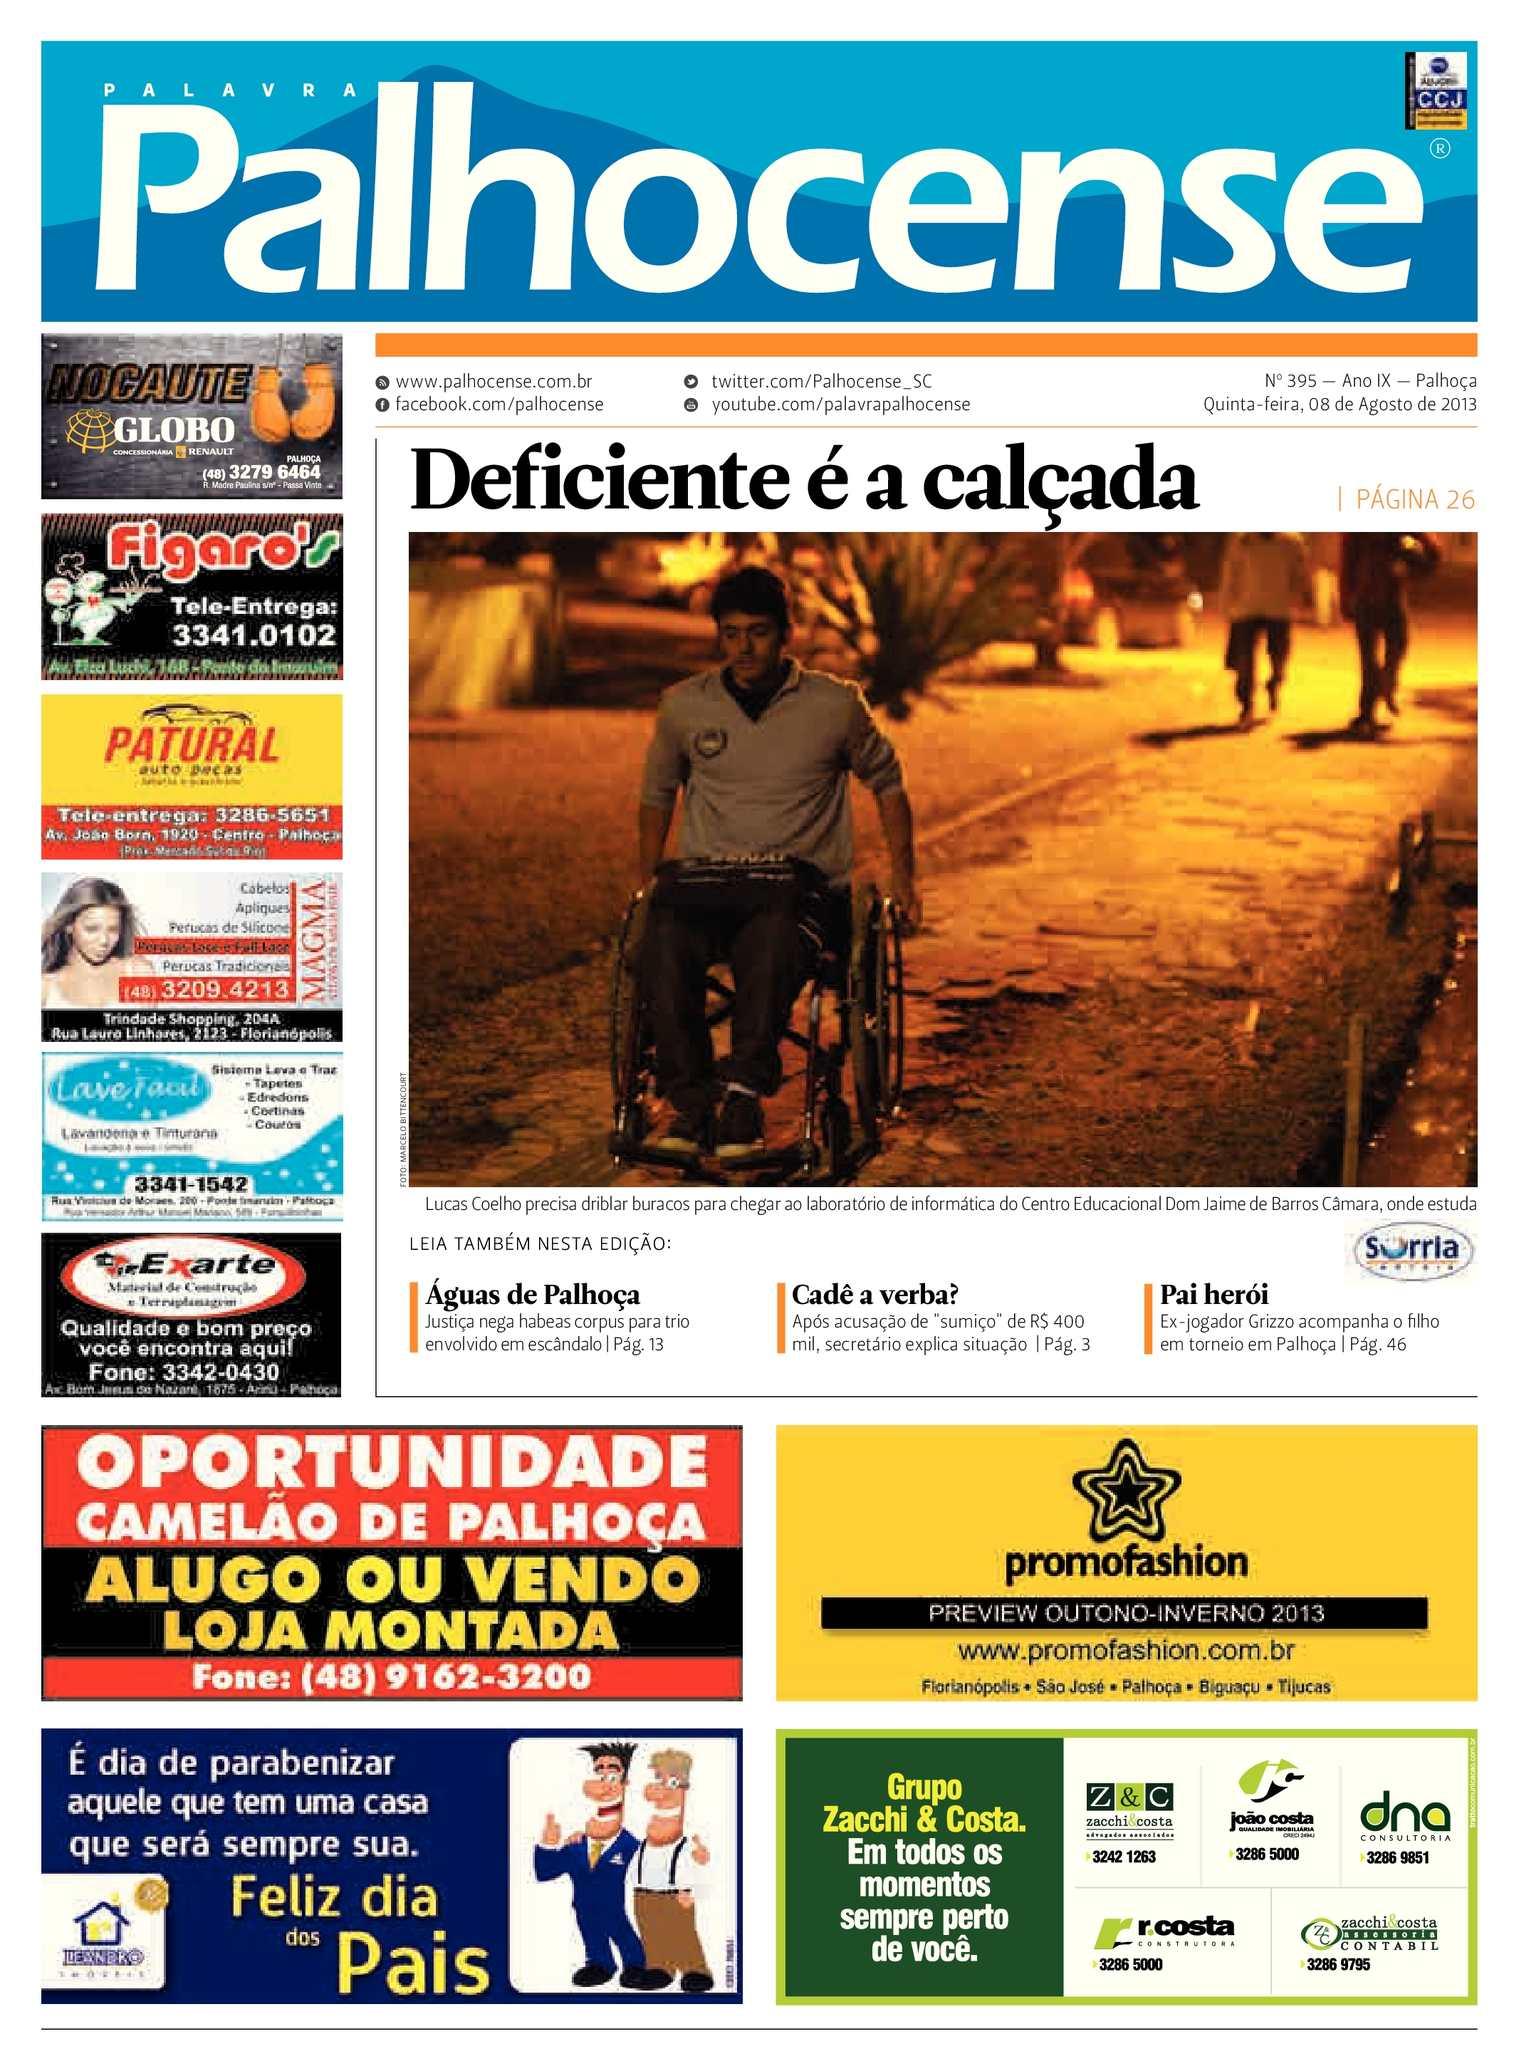 Calaméo - Jornal Palavra Palhocense - Edição 395 4038a360385